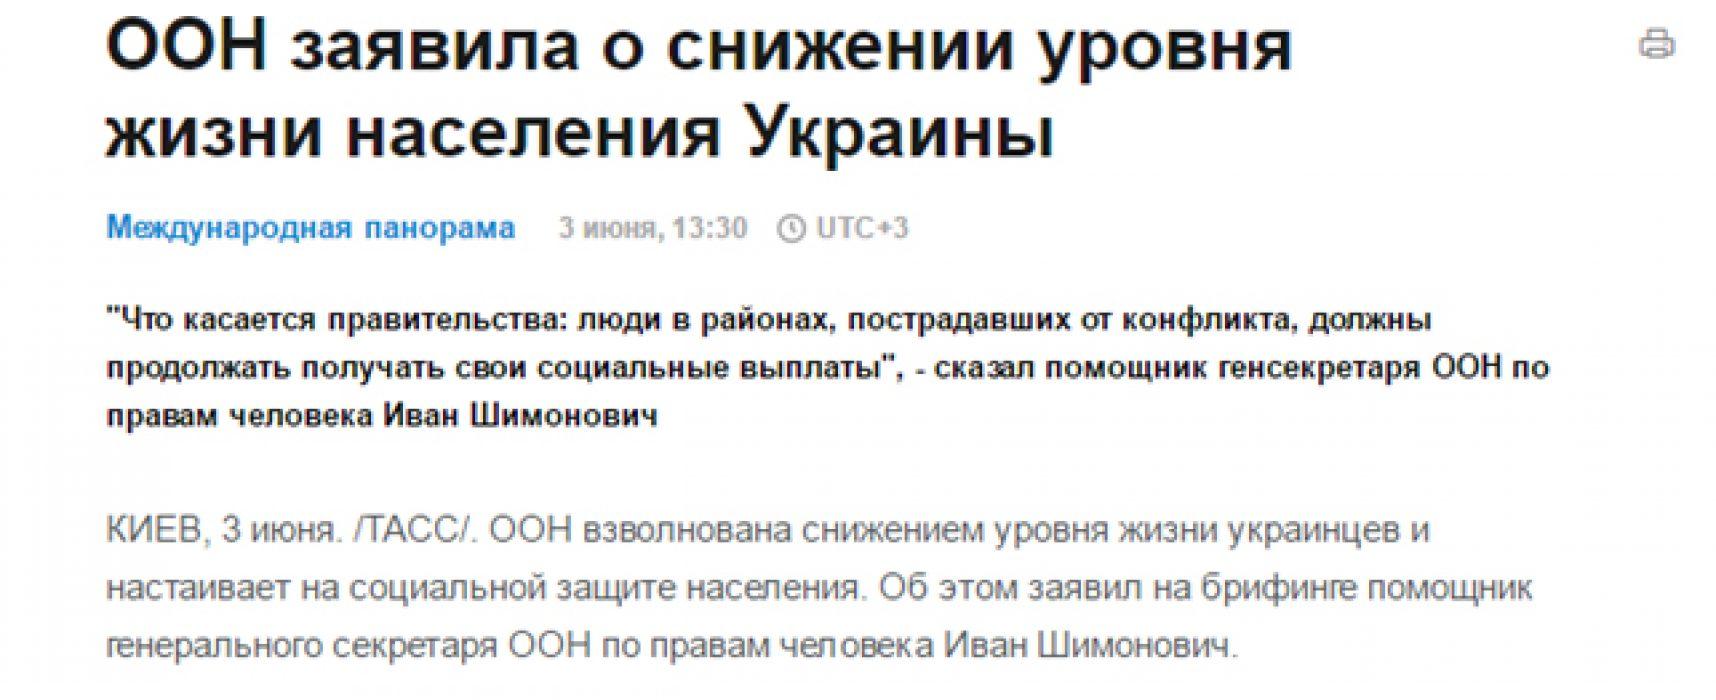 TASS: VN bezorgd over dalende Oekraïense levensstandaard